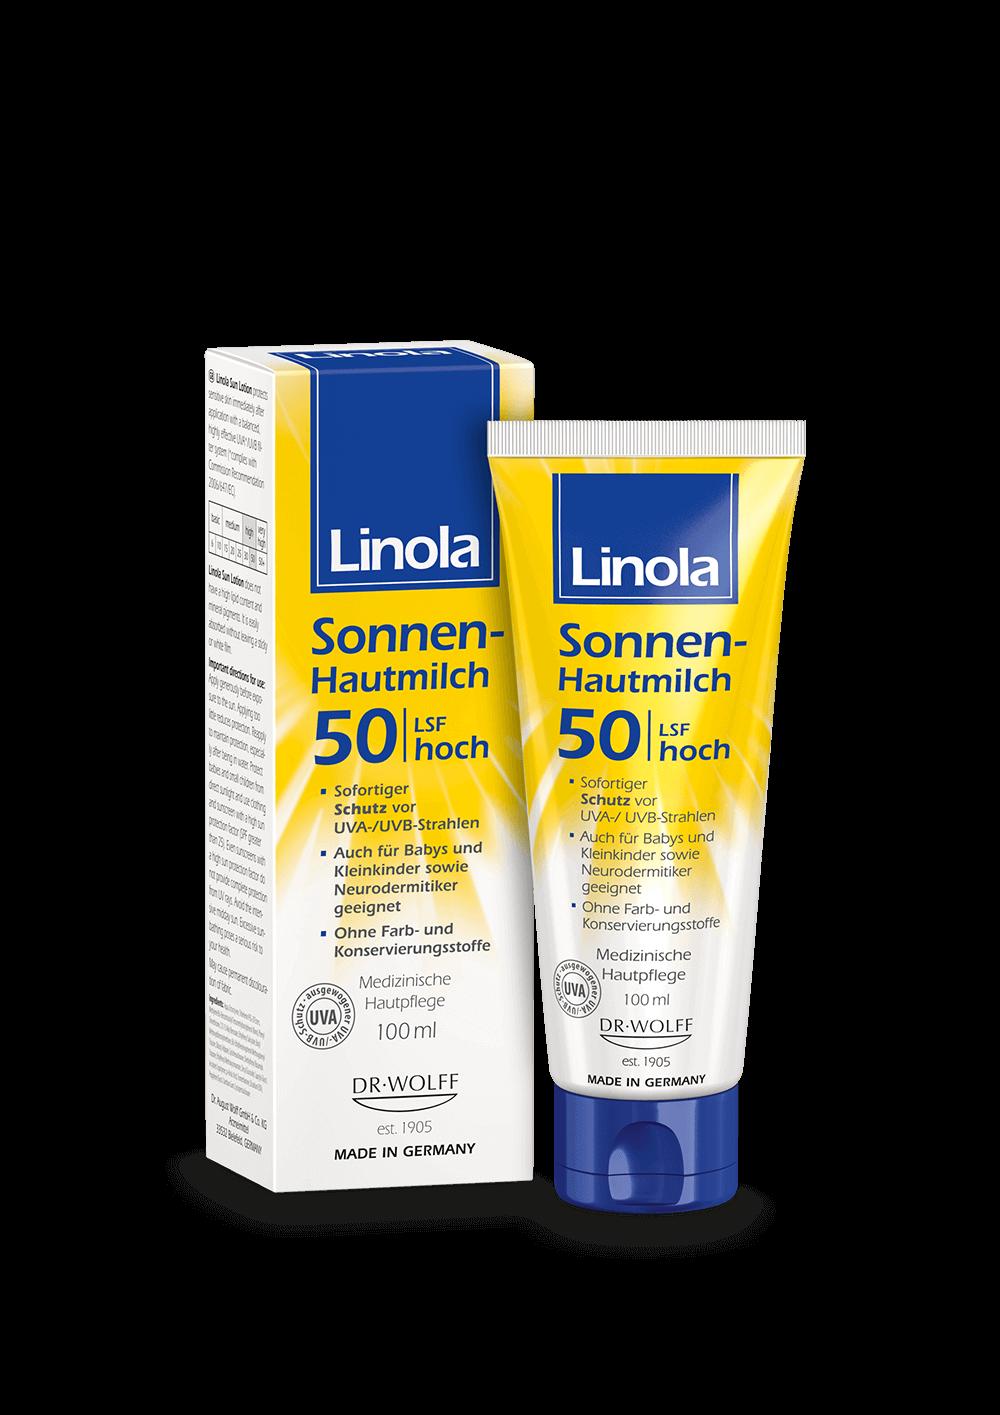 Linola Sonnen-Hautmilch